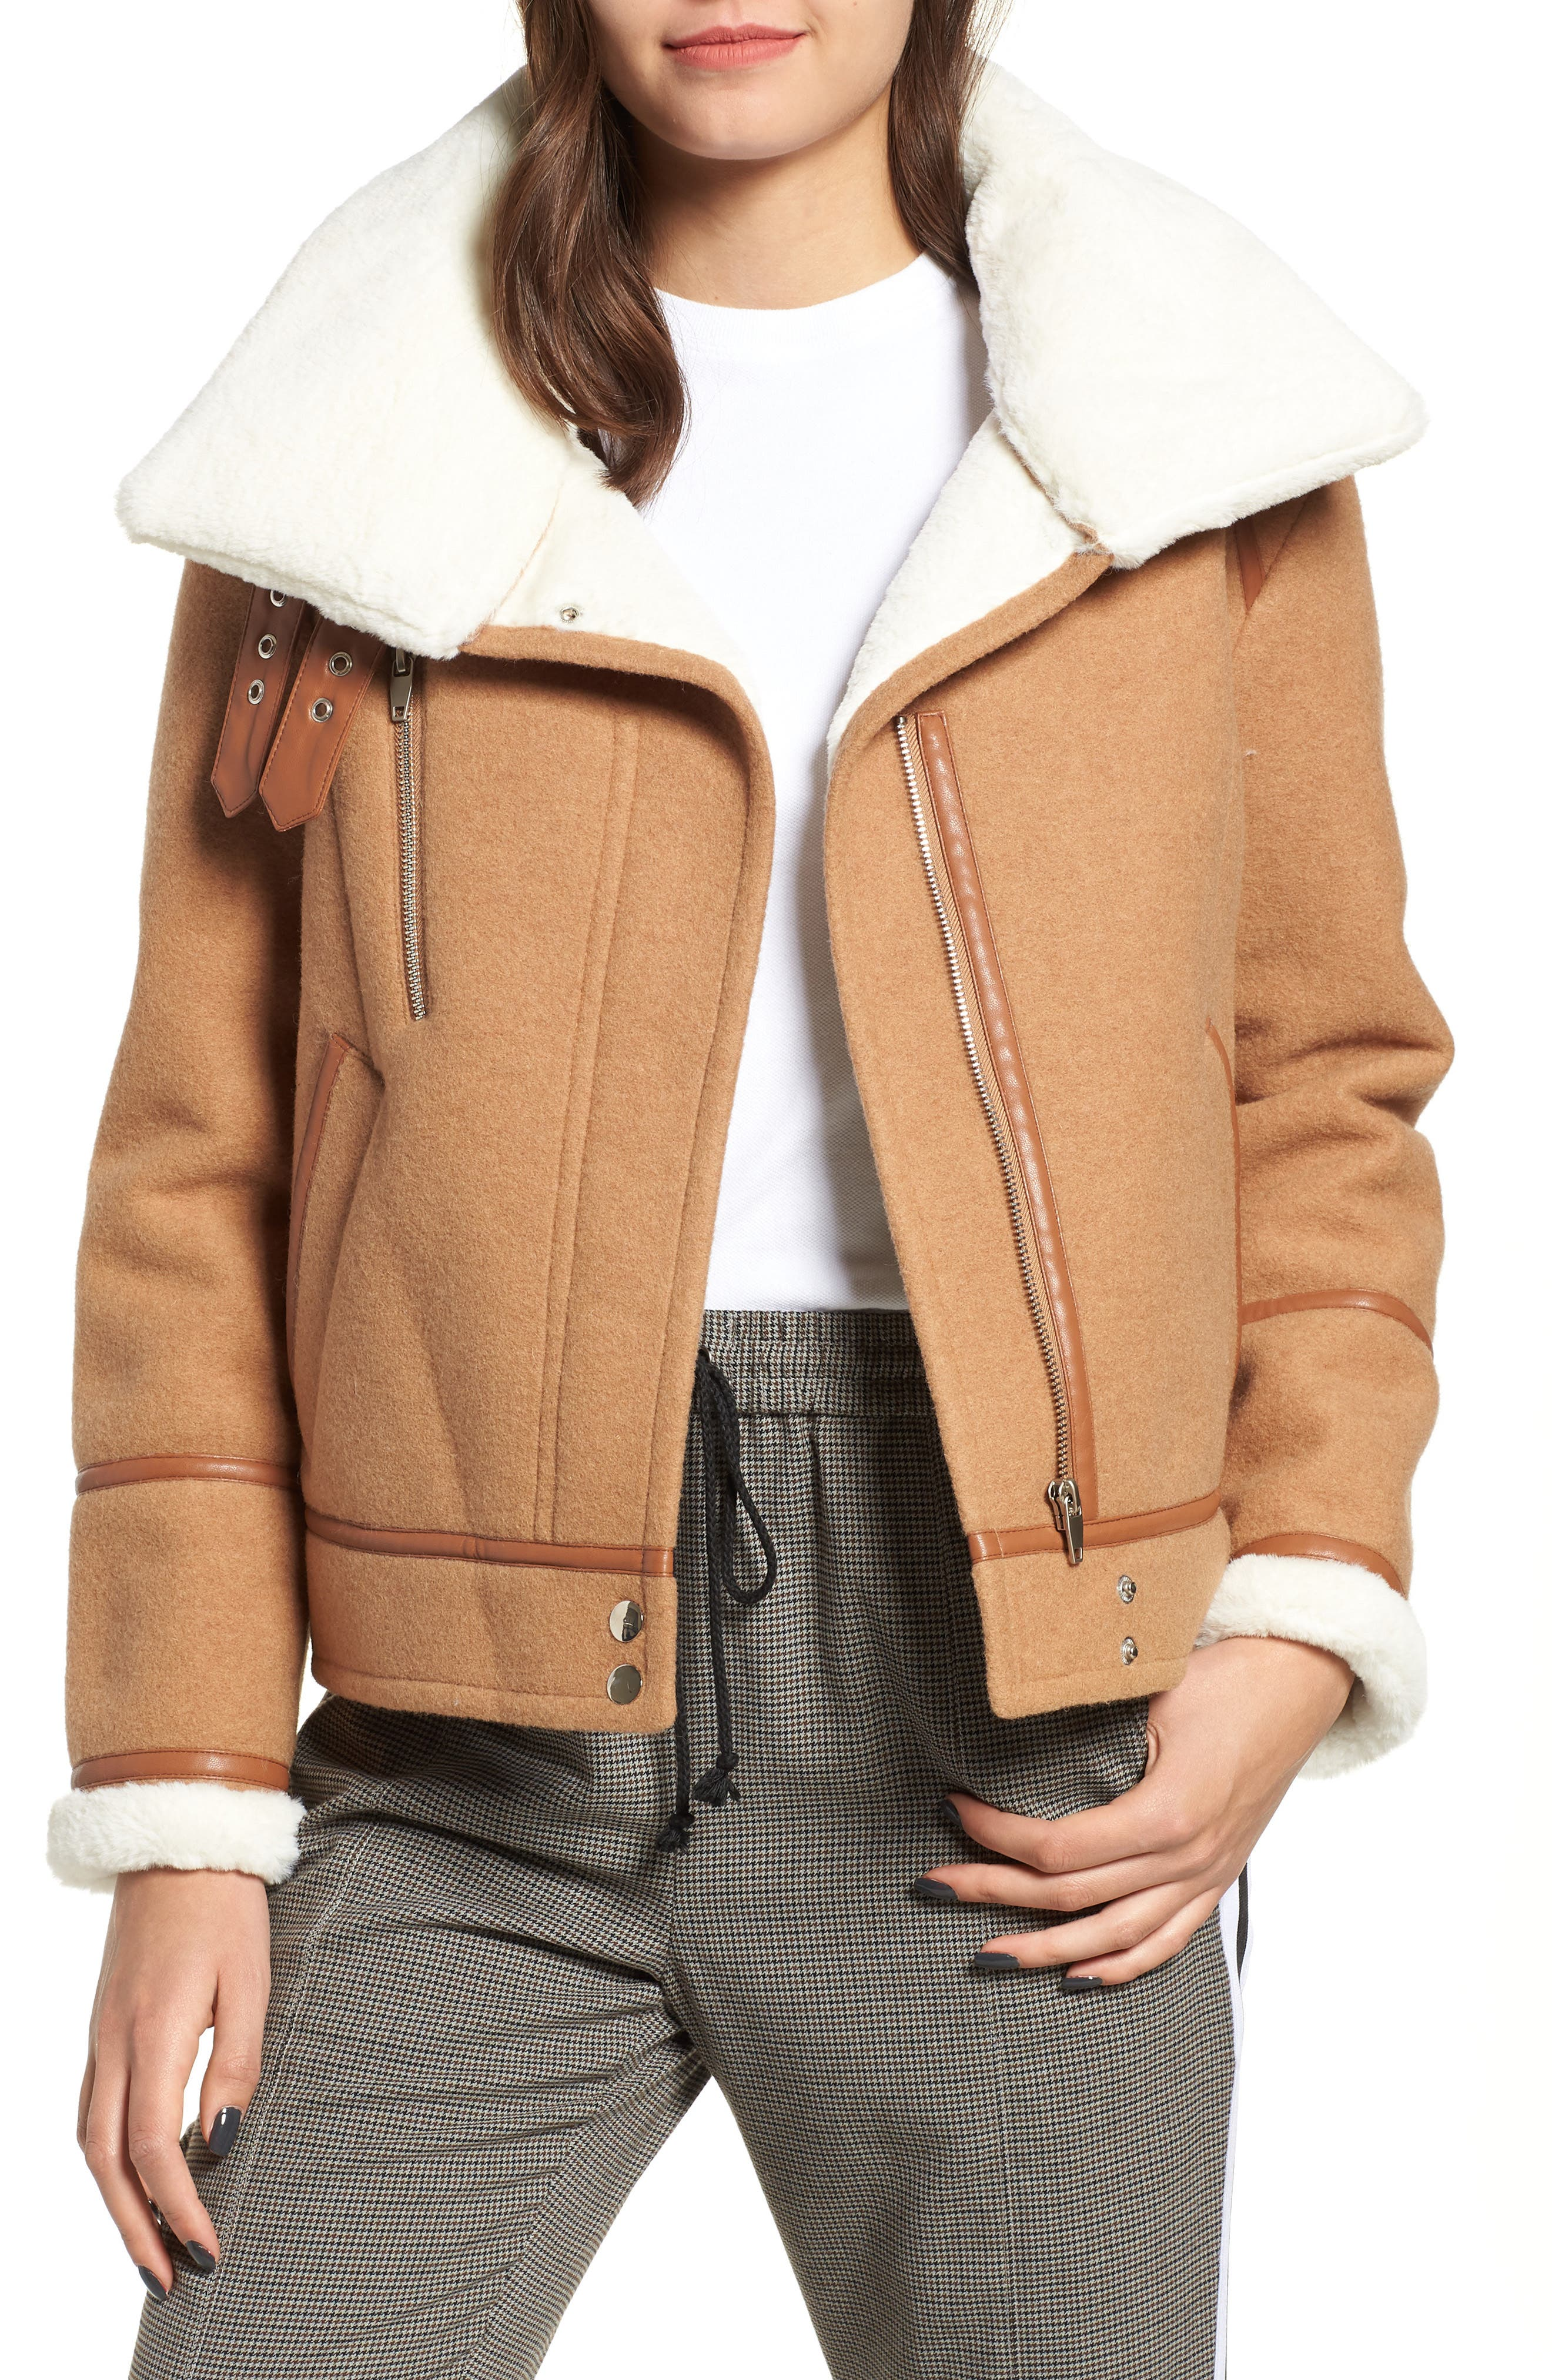 NVLT, Brushed Melton Wool Blend Jacket, Main thumbnail 1, color, CAMEL/ CREAM